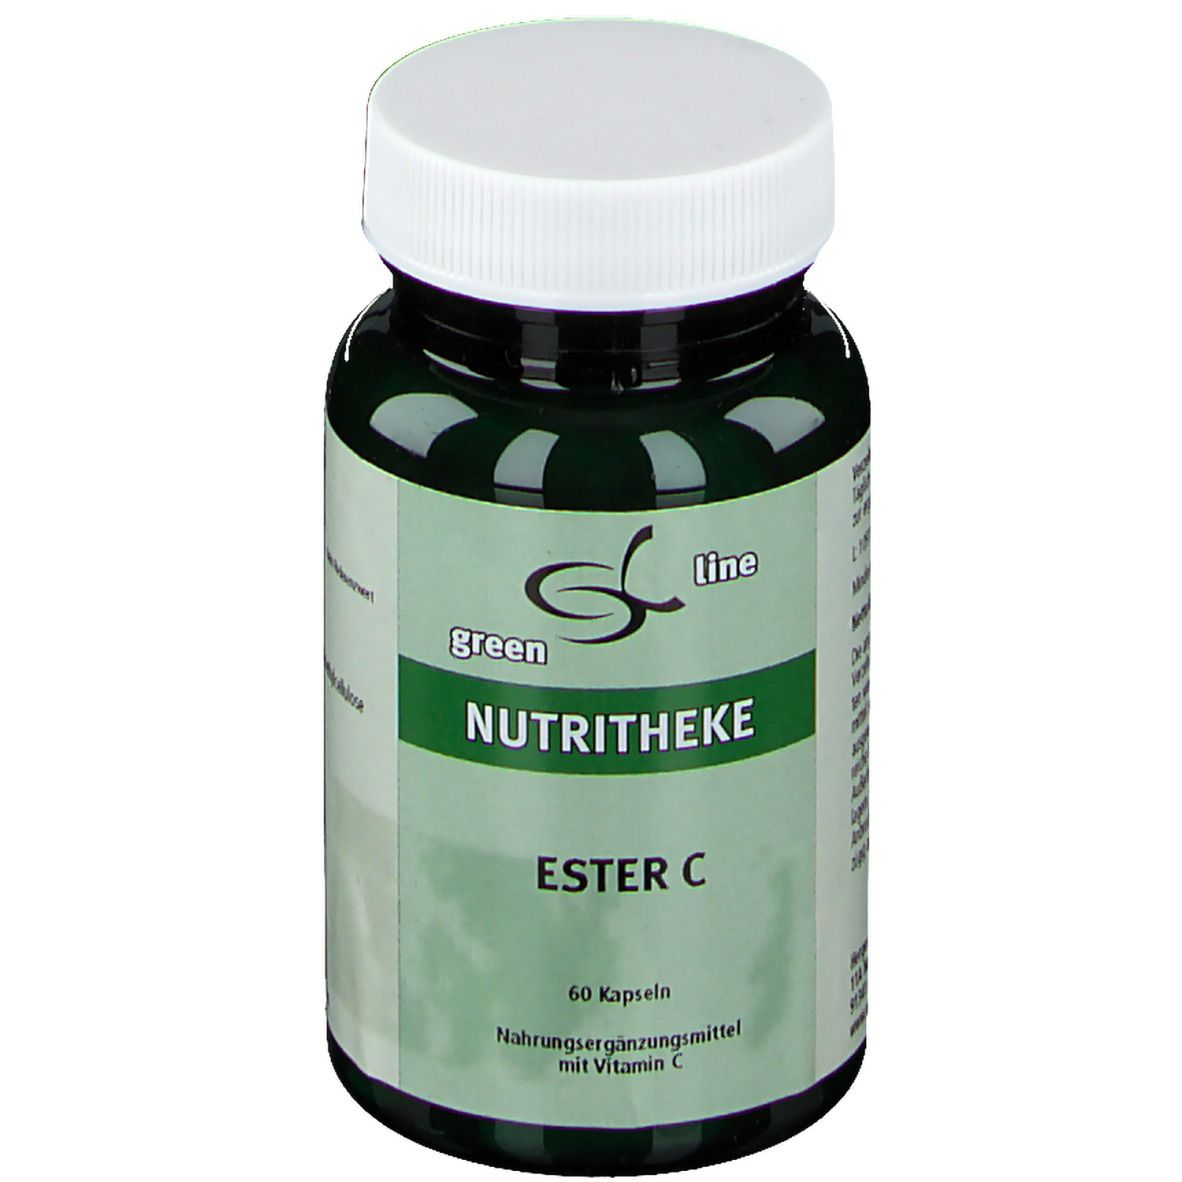 Image of green line Ester C